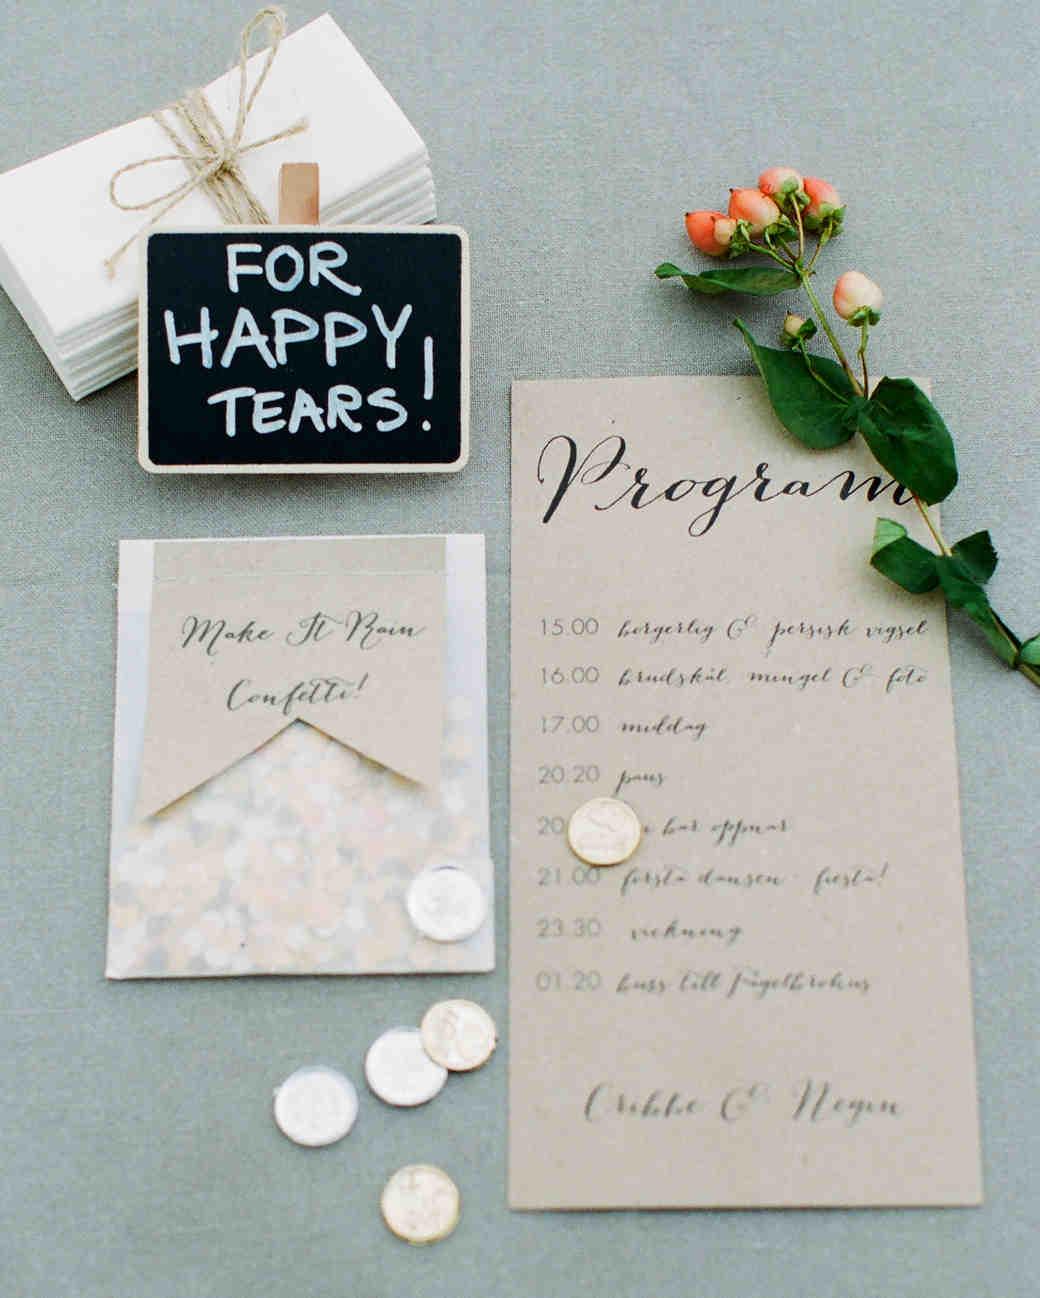 negin-chris-wedding-program-0018-s112116-0815.jpg